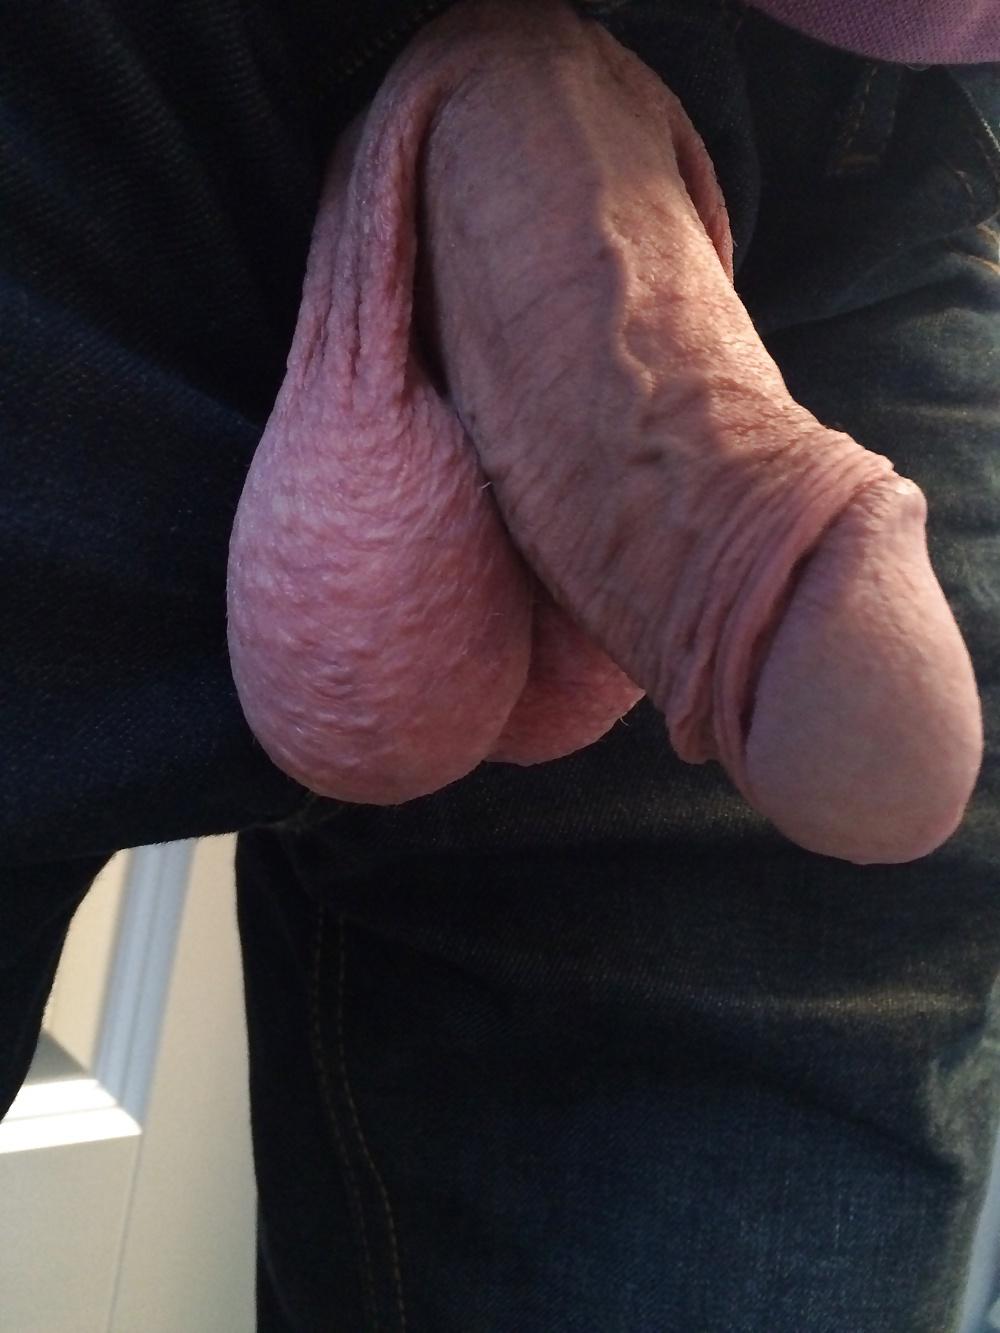 Big bull balls and little uncut cock